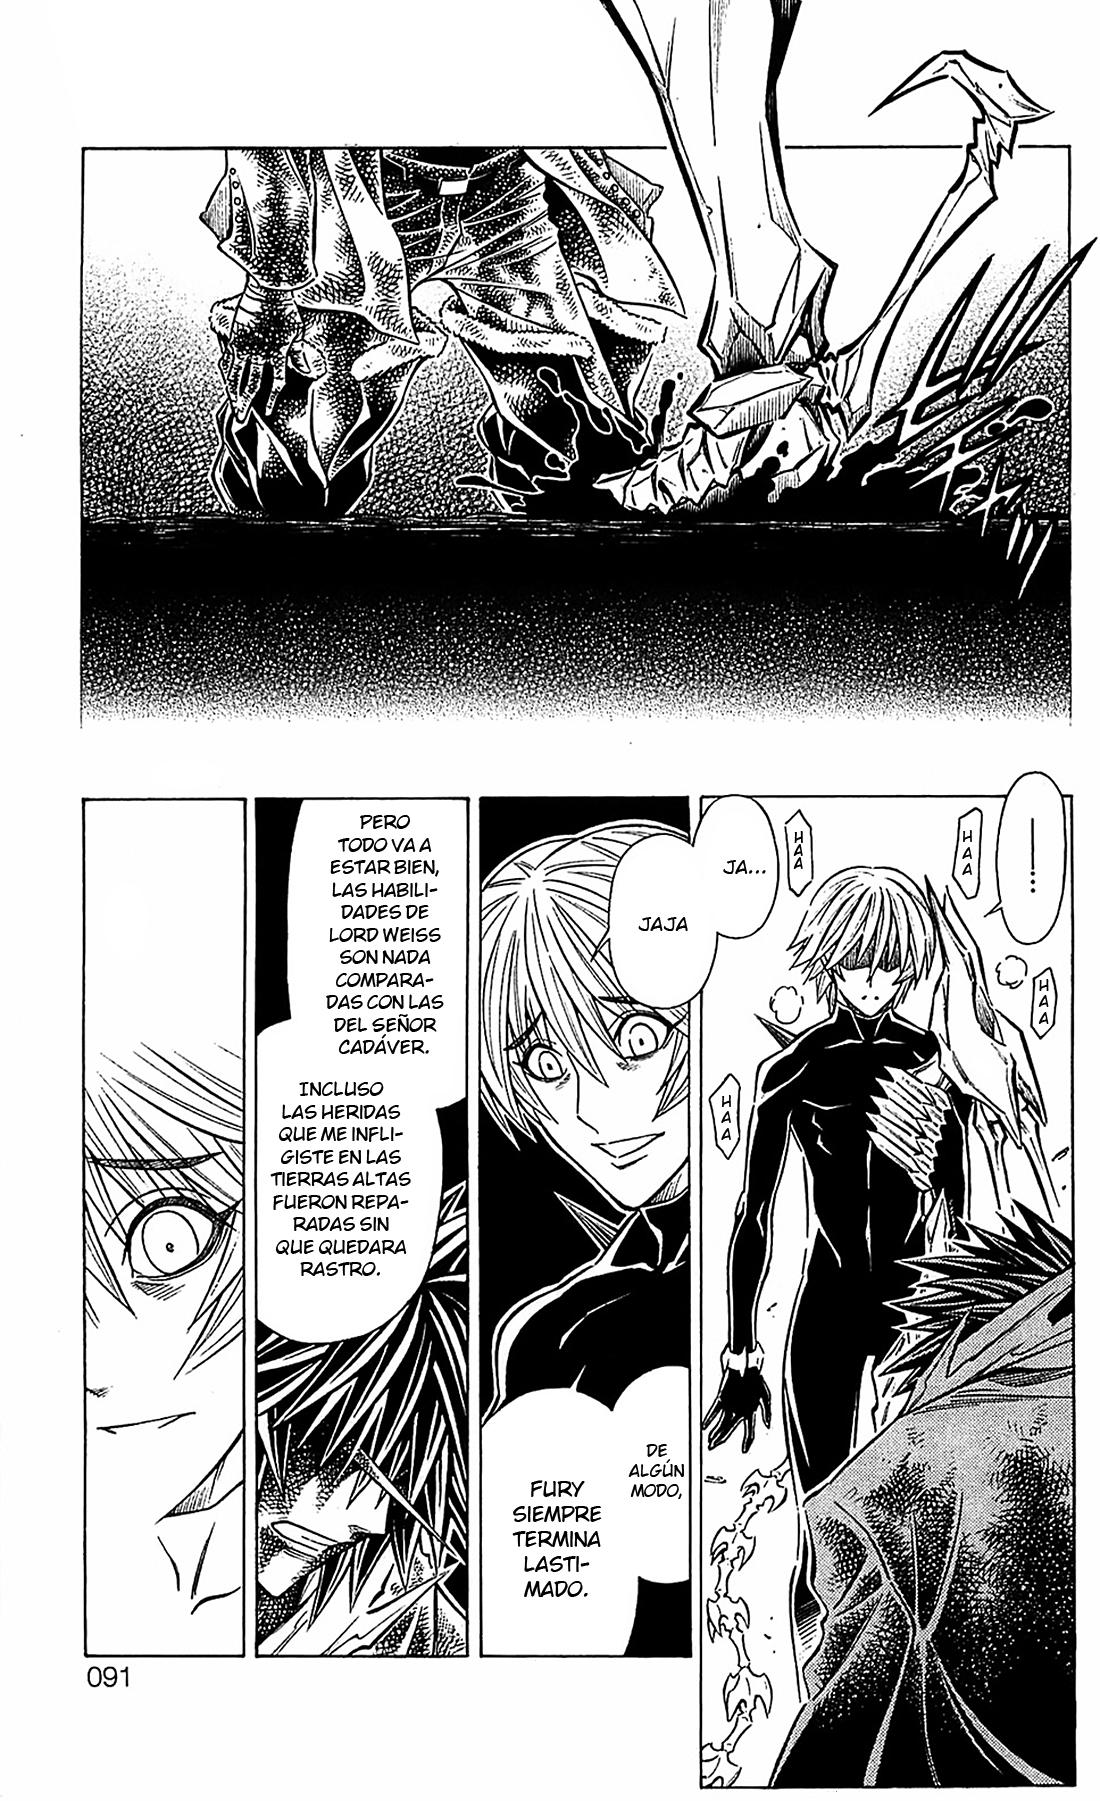 http://c5.ninemanga.com/es_manga/45/18797/447916/e8ecbab3e43a0e78243075c4a91a5028.jpg Page 14